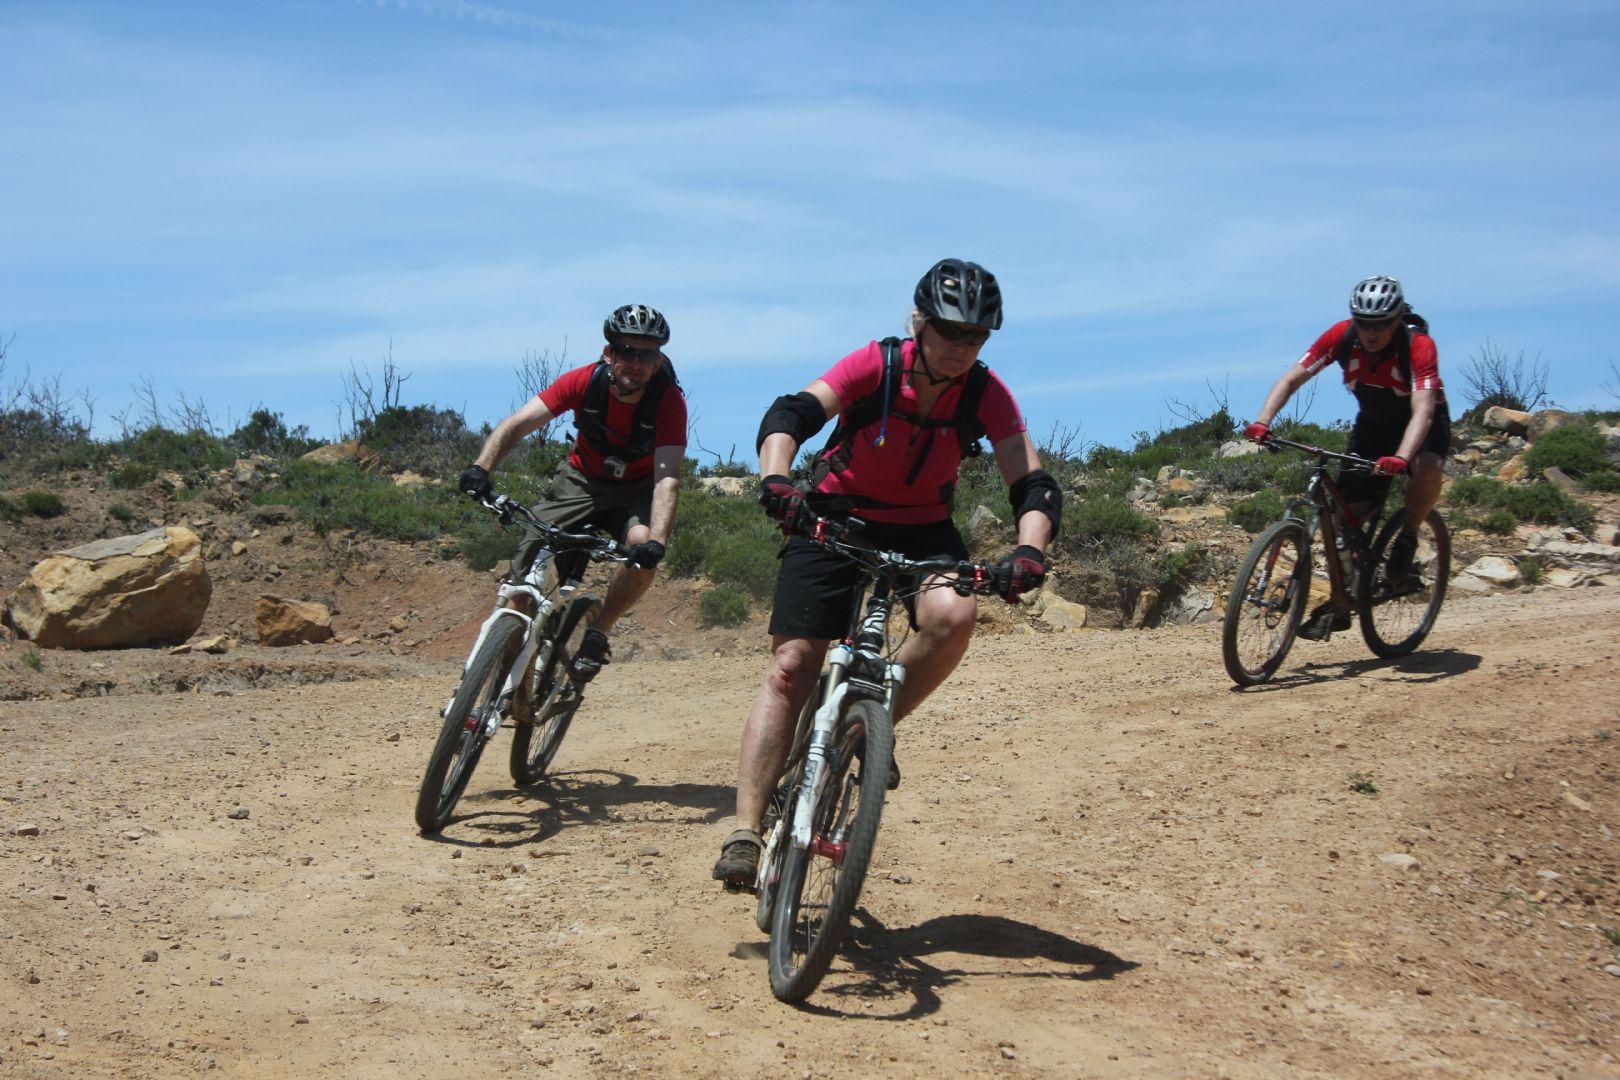 Spain Trans Andaluz MTB 9264.JPG - Spain - Trans Andaluz - Guided Mountain Bike Holiday - Mountain Biking